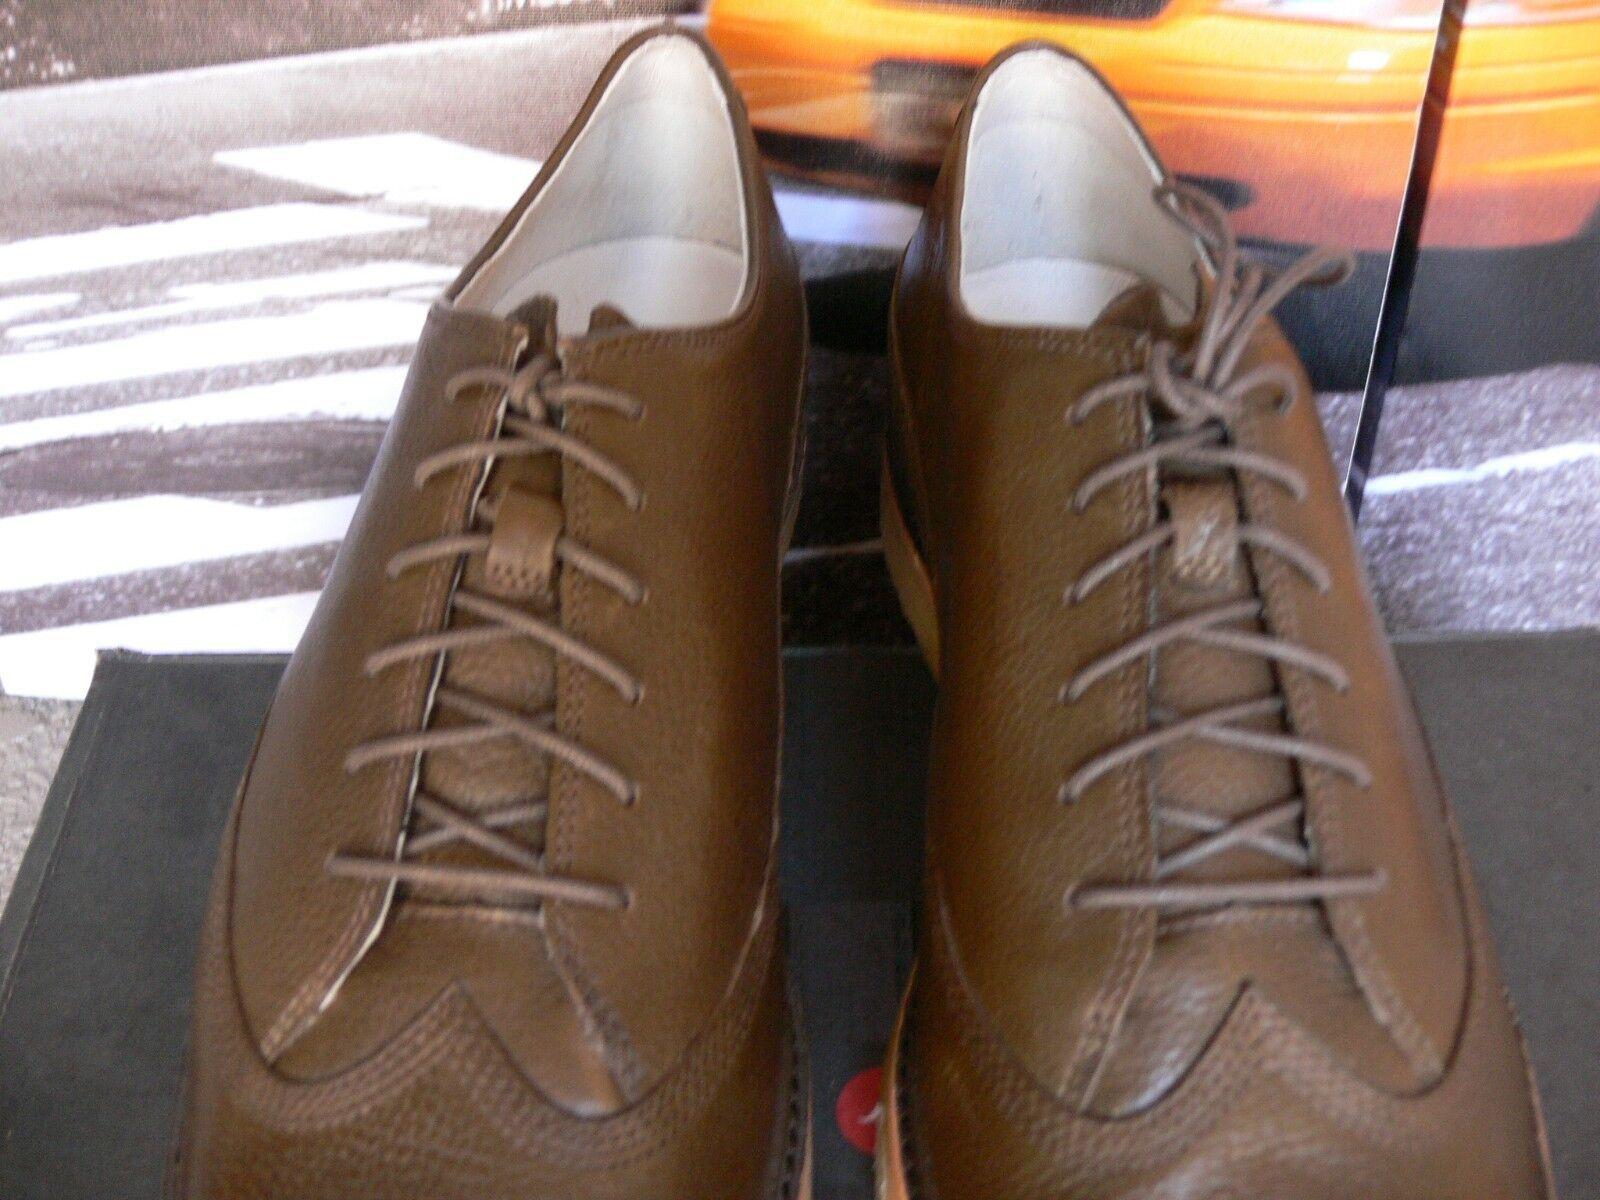 NEW Tsubo Hesperia Hesperia Hesperia  wingtip Marronee   Olive  Leather 8187 crepe sole US 9 So Nice 8b473e